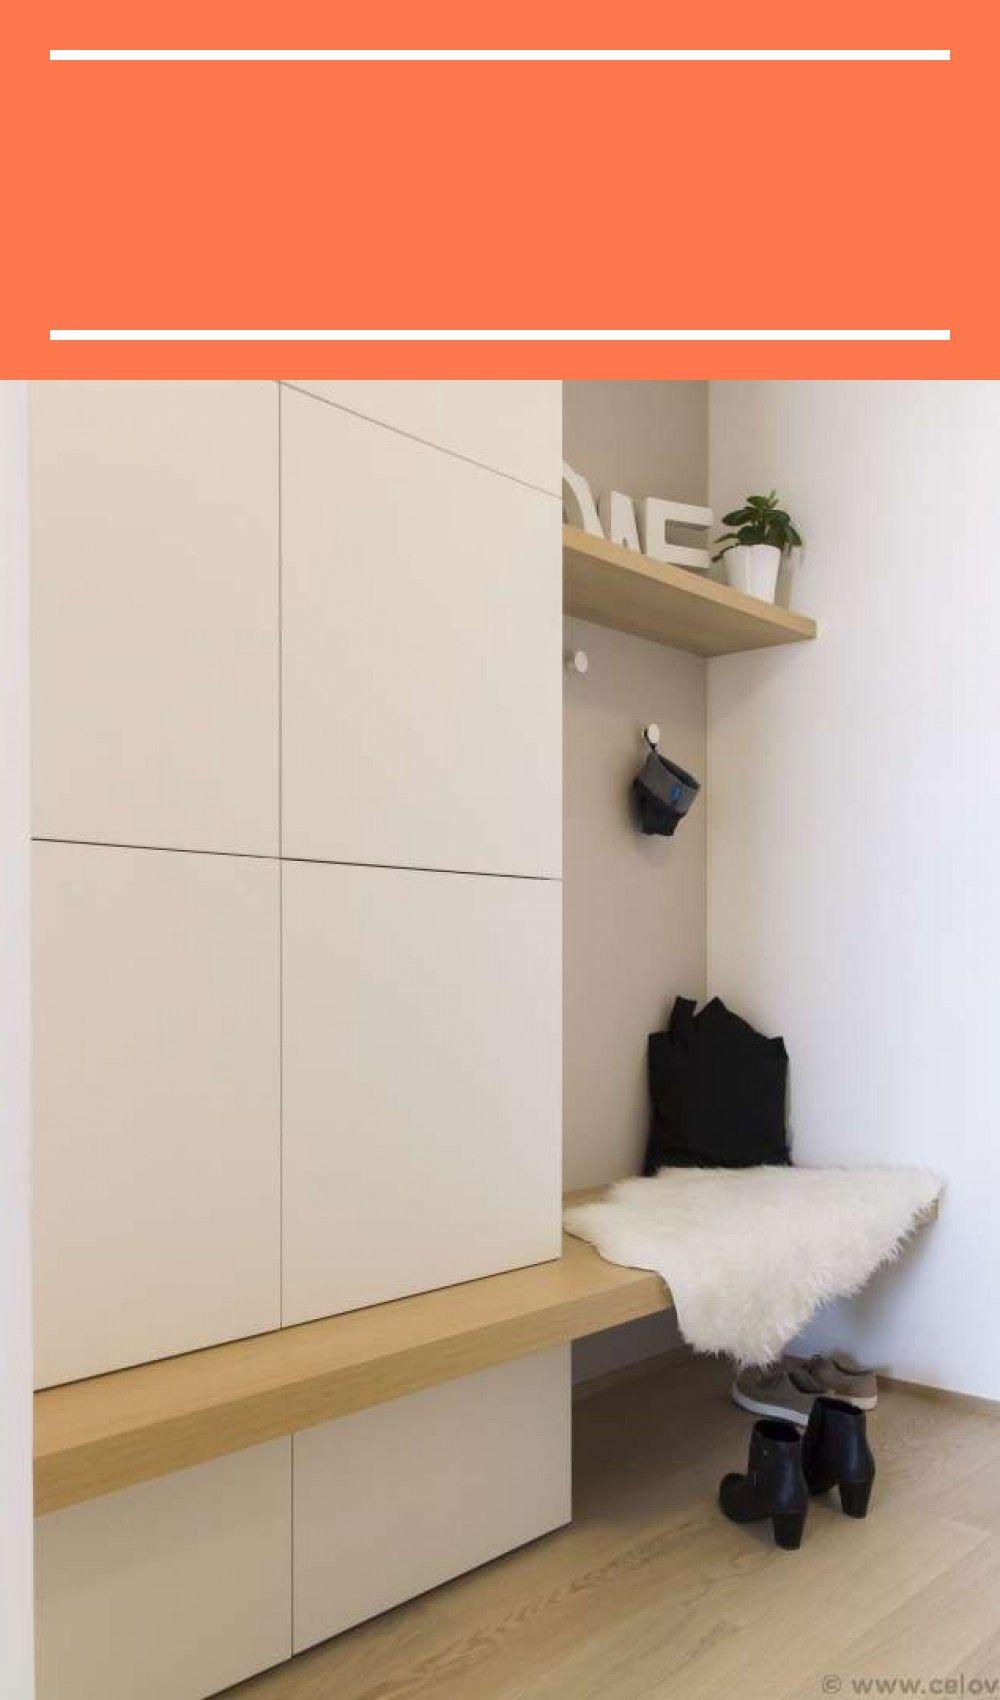 Garderobe Ideen Ikea In 2020 Storage Bench Furniture Home Decor